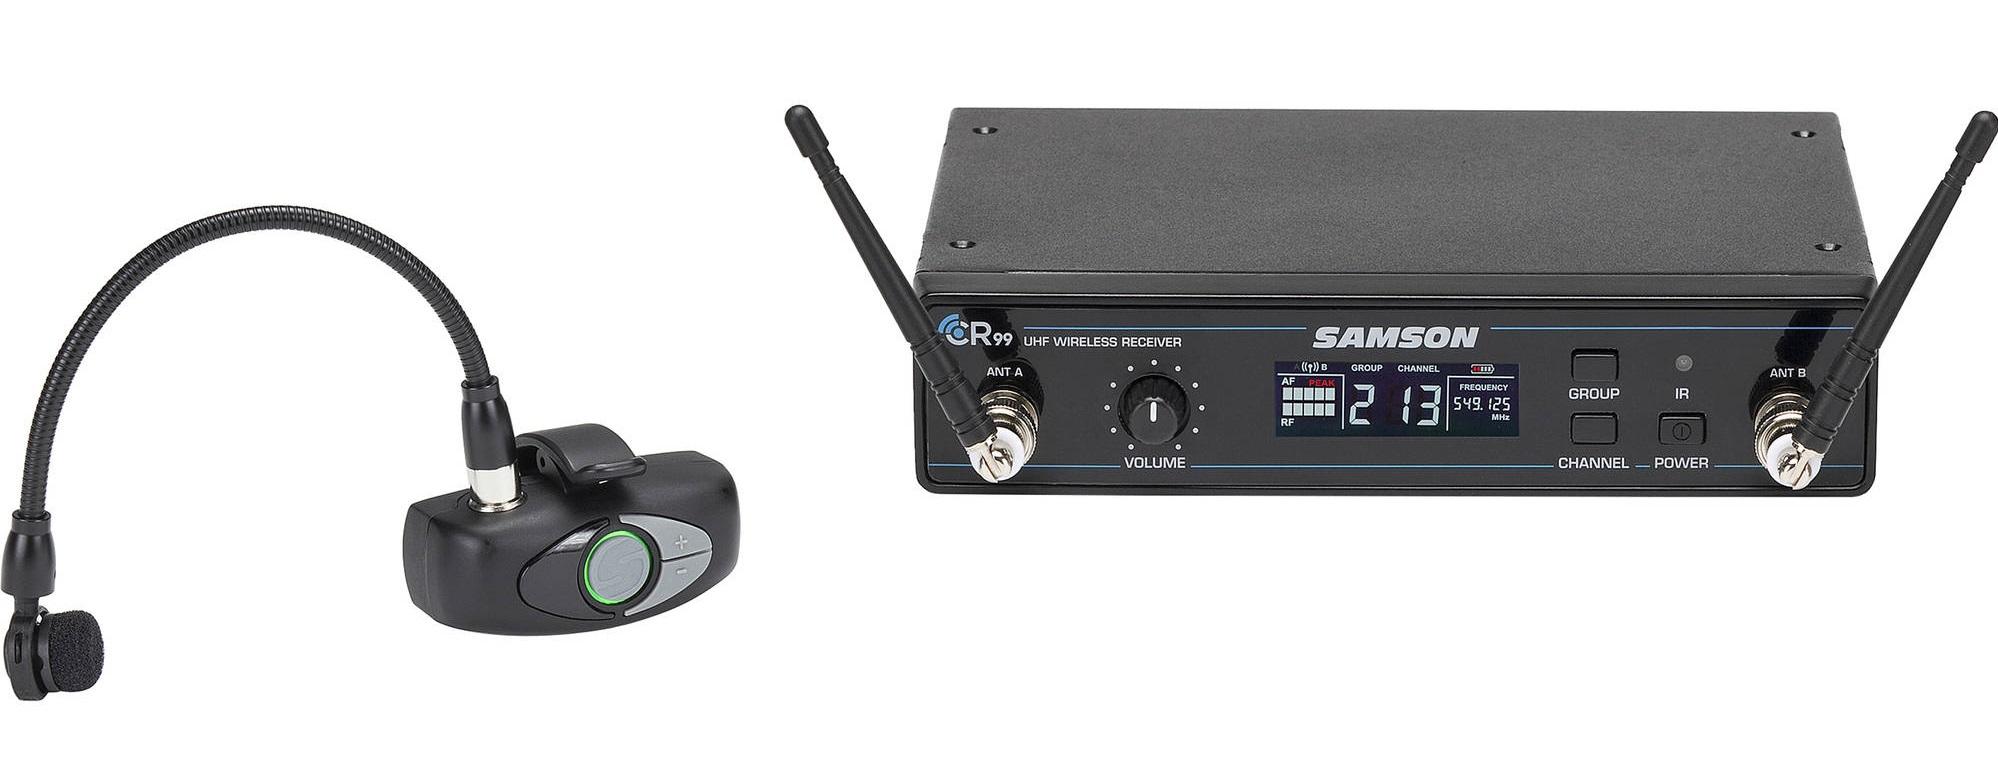 samson-awx-wind-instrument-system-band-d.jpeg